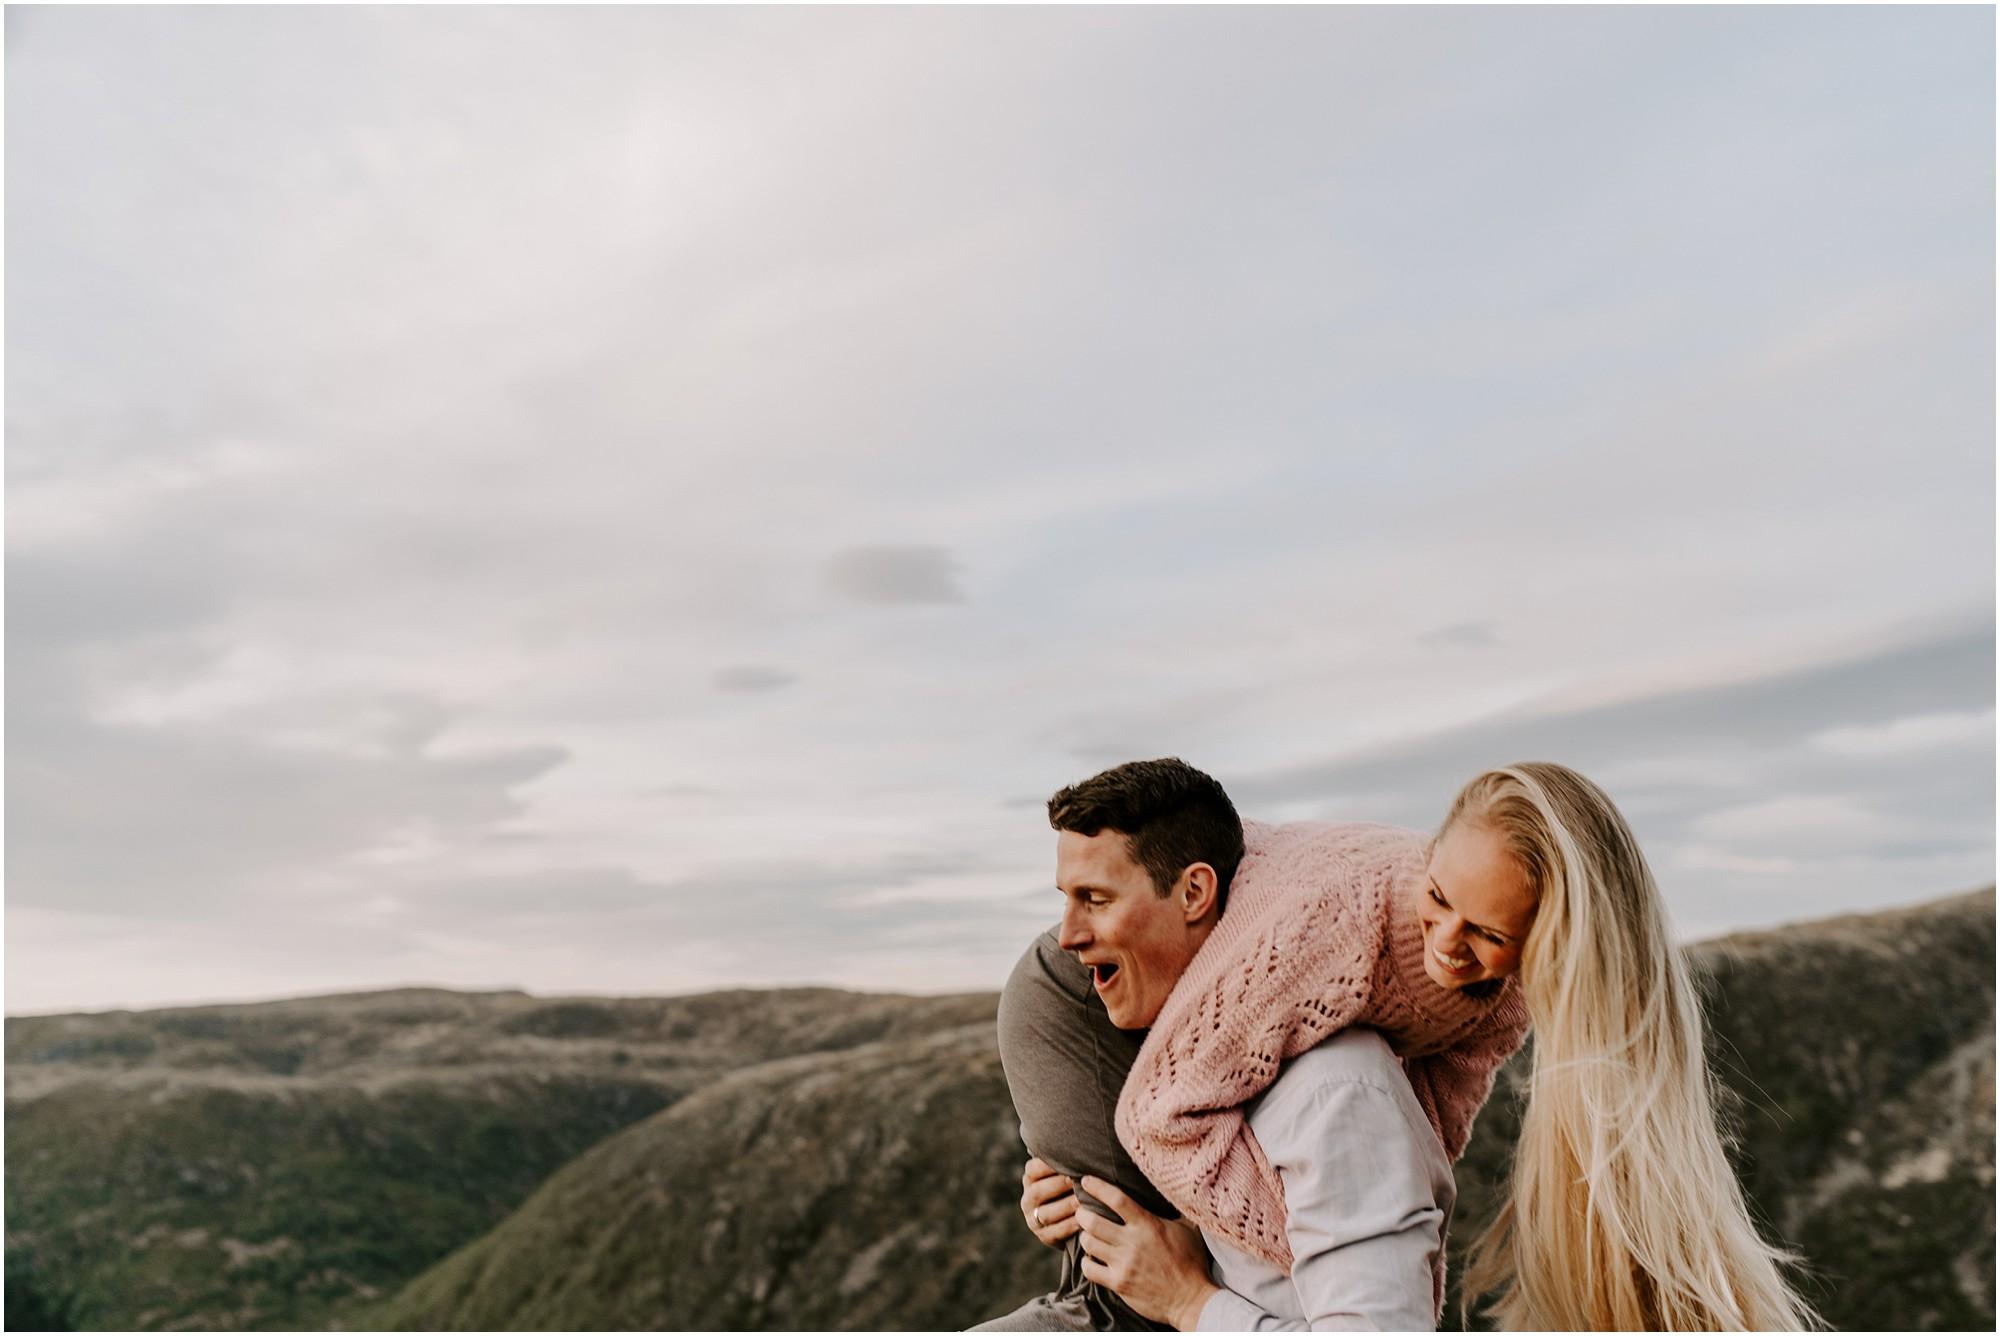 norway-engagement-session-destination-elopement-photographer_0015.jpg